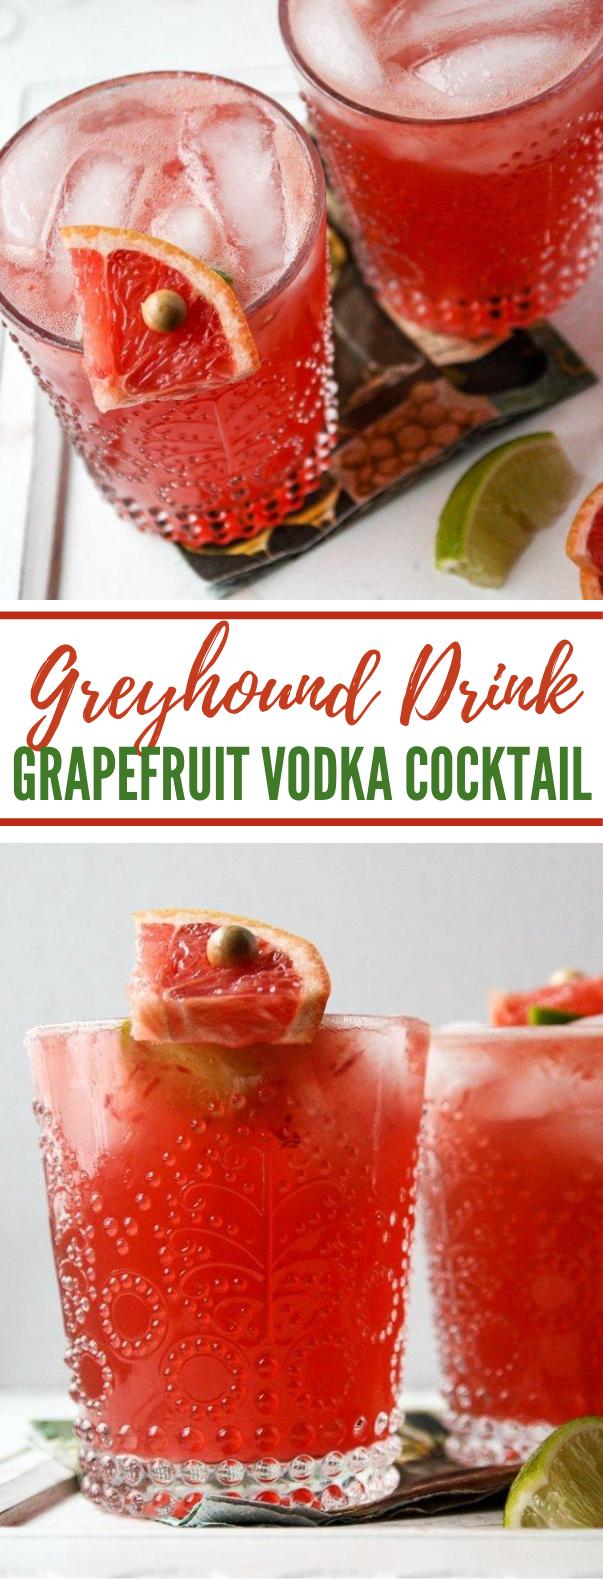 Greyhound Drink- Grapefruit Vodka Cocktail #drinks #freshdrink #cocktails #vodka #partydrink